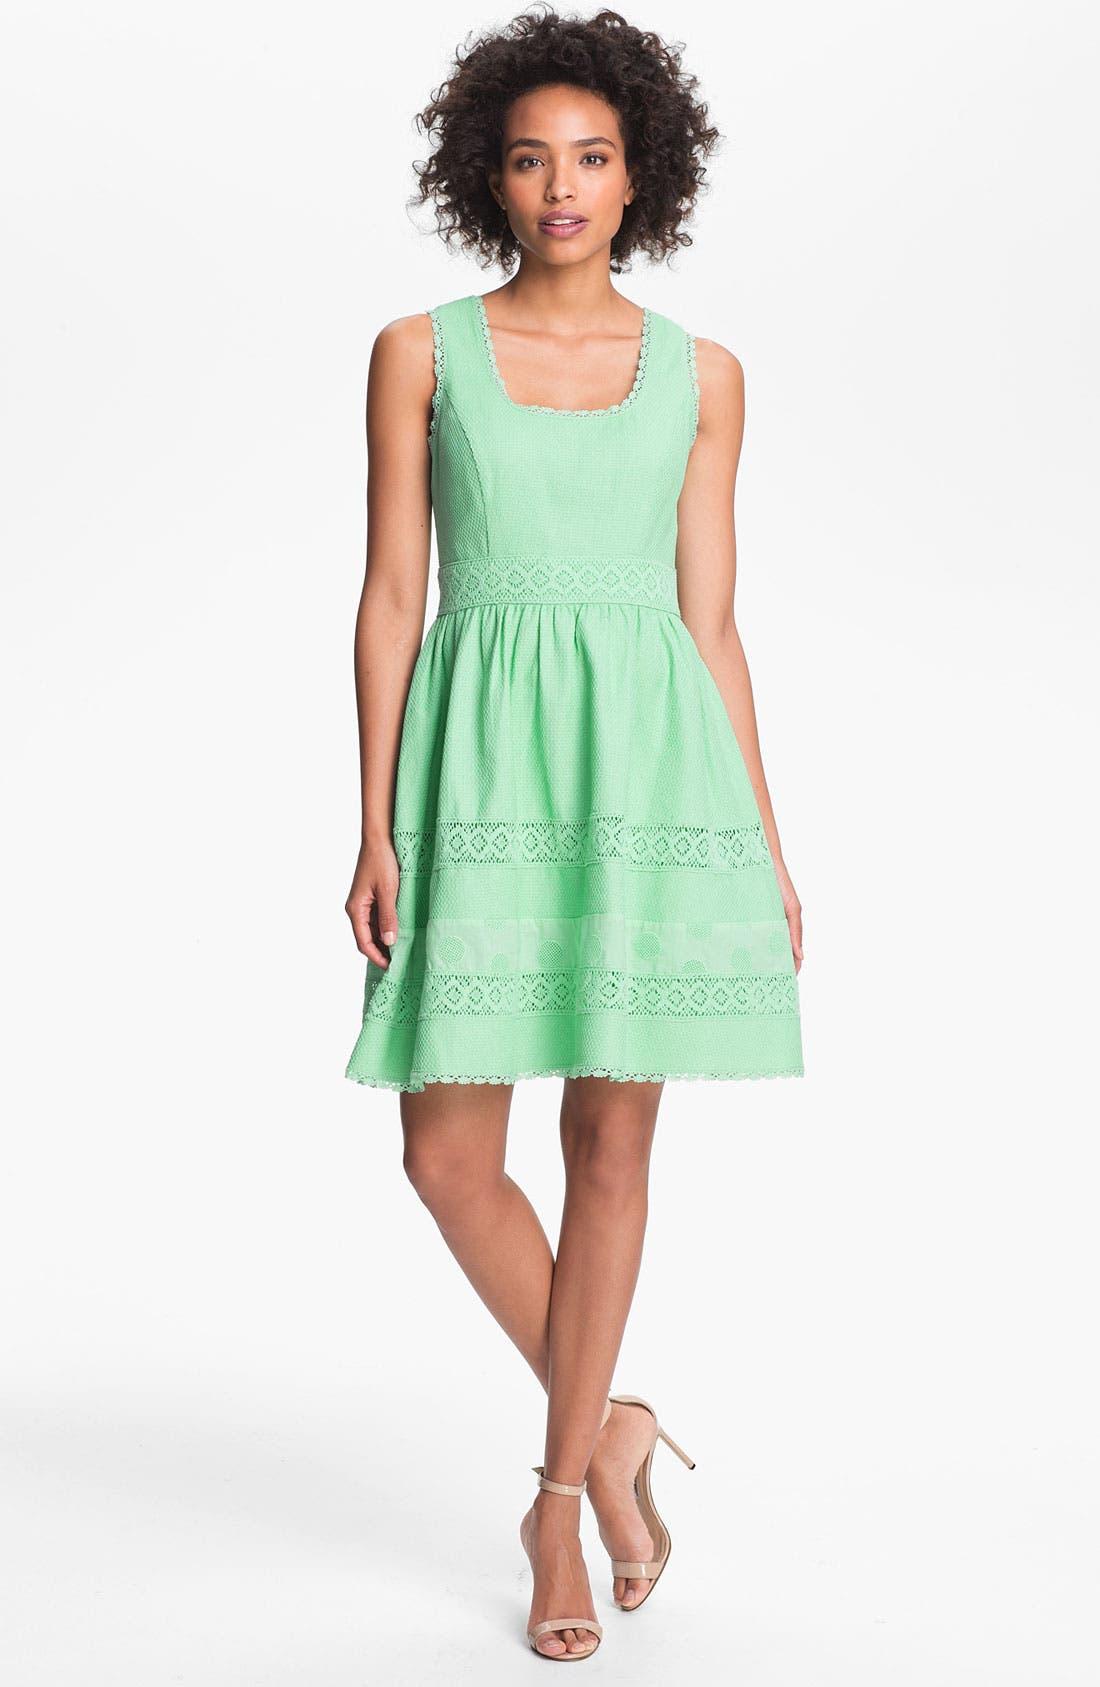 Alternate Image 1 Selected - Jessica Simpson Basket Weave Fit & Flare Dress